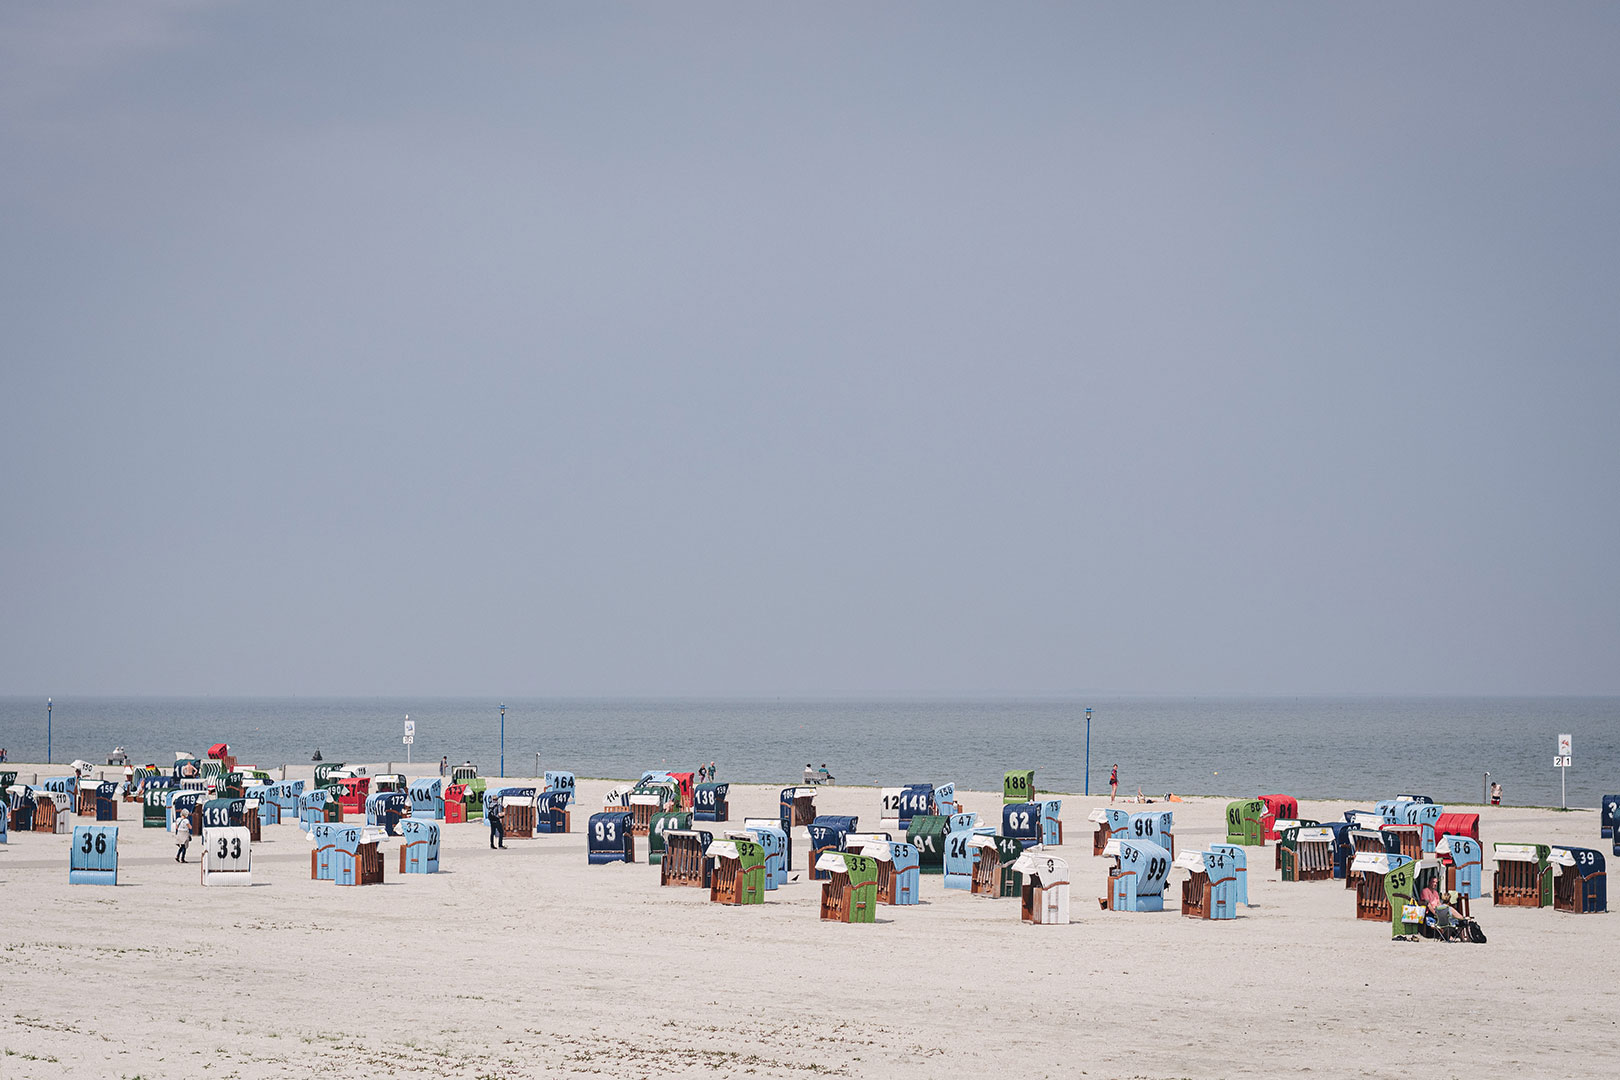 Strand mit Strandkörben in Neuharlingersiel